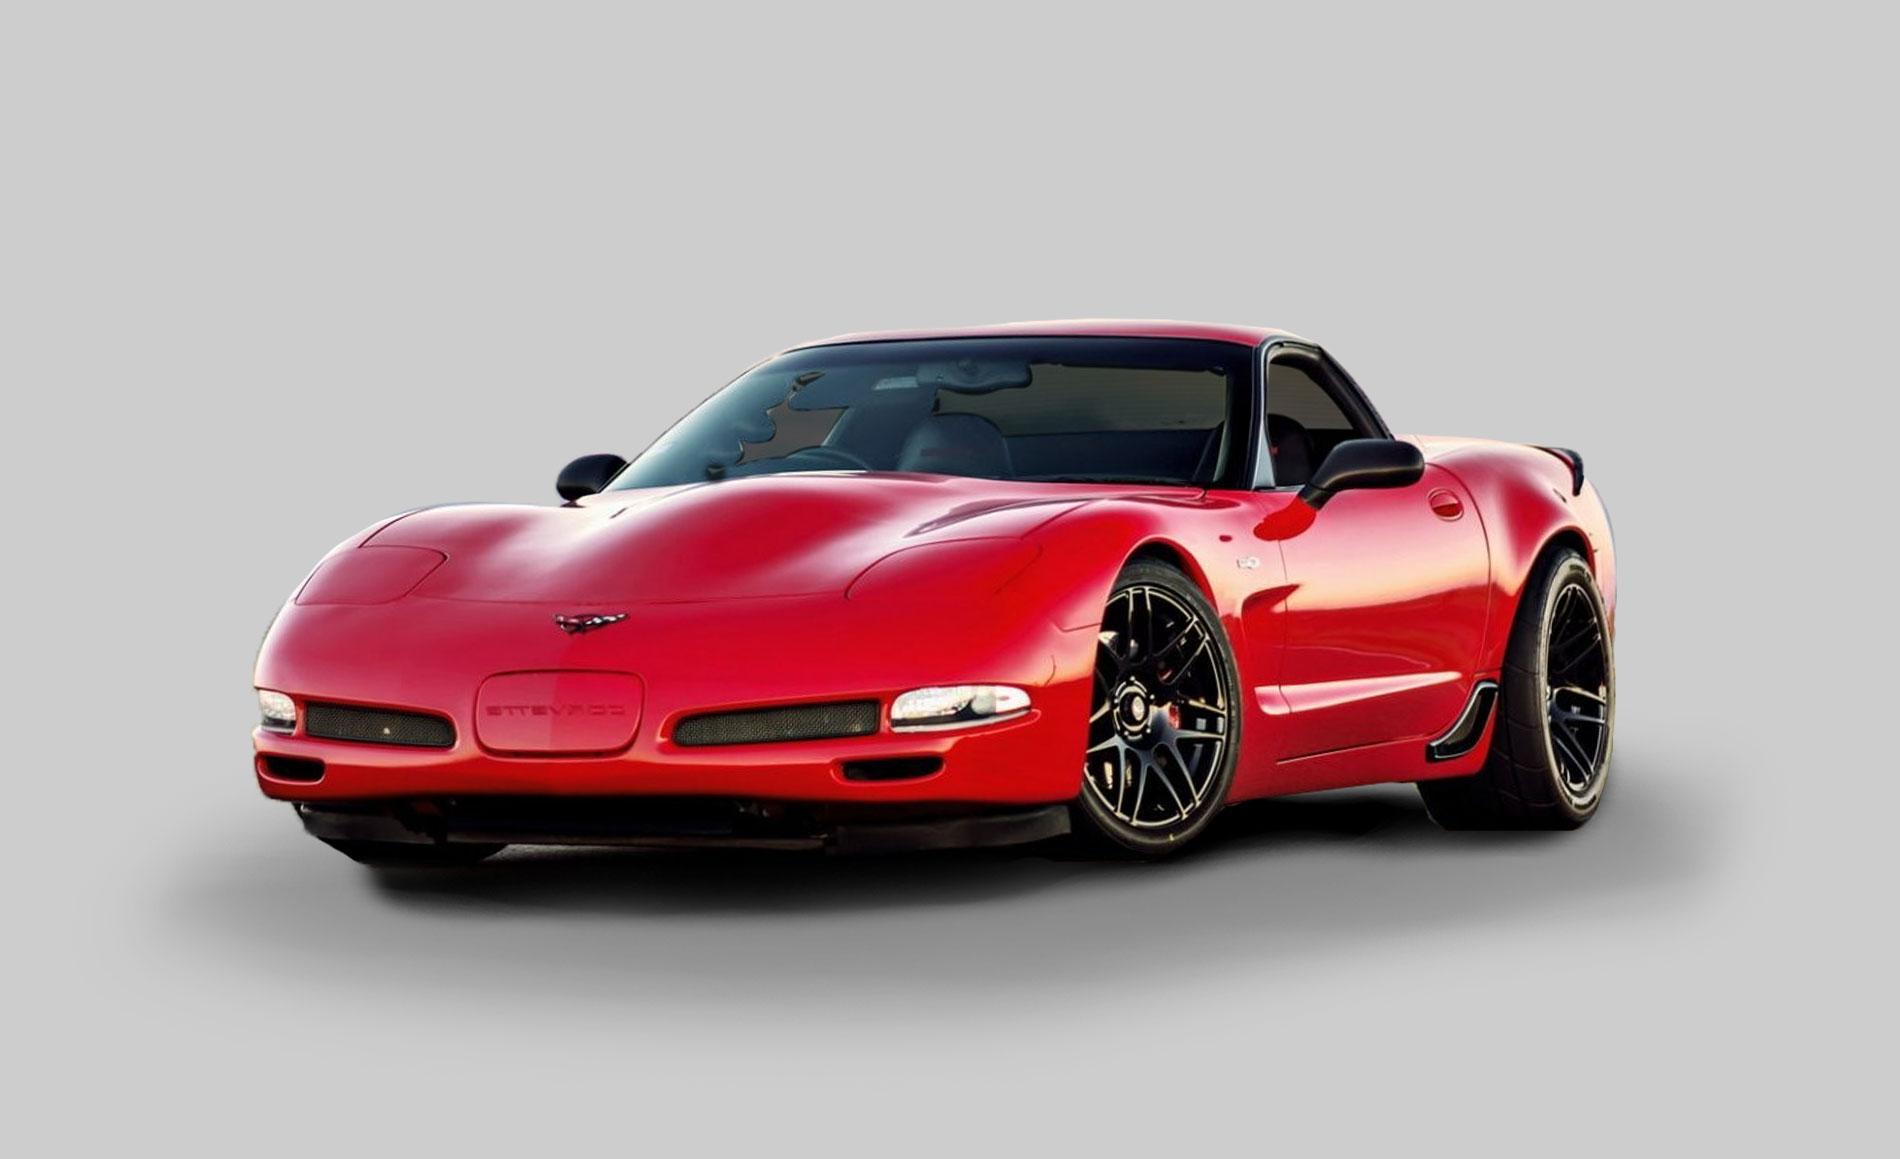 Kelebihan Corvette C5 Z06 Spesifikasi